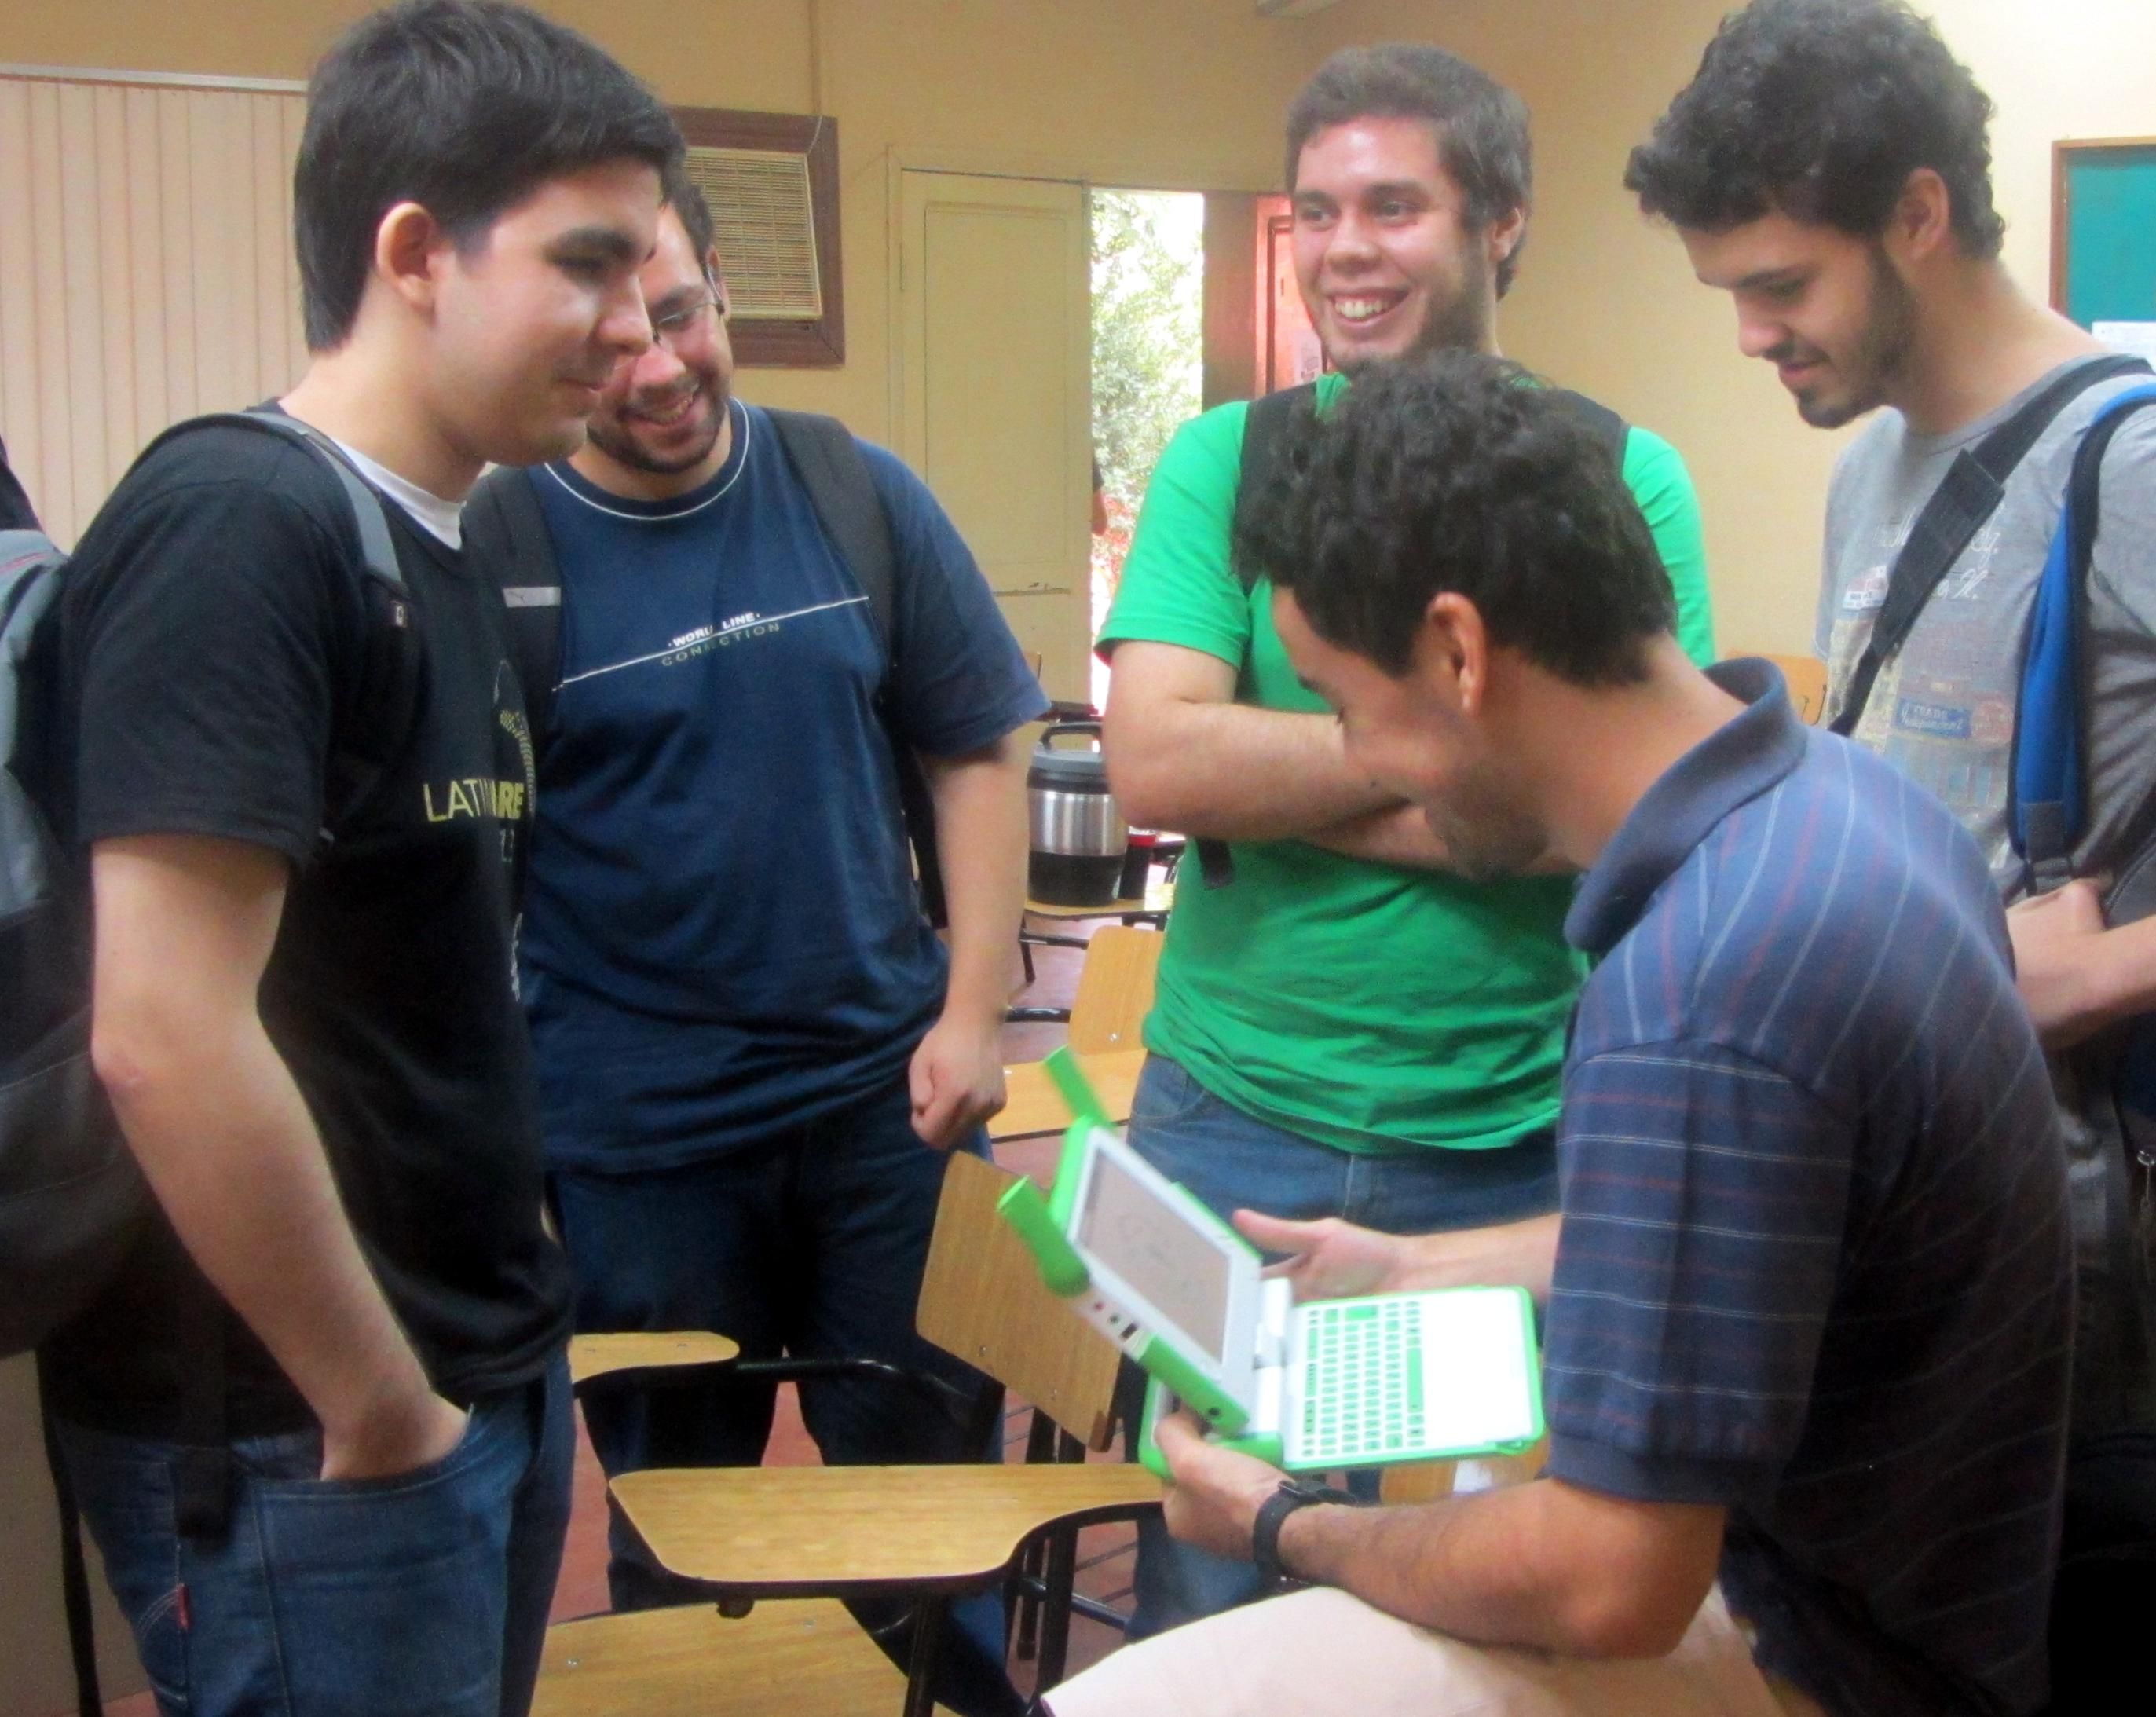 Networking de la charla informativa sobre el Google Summer of Code